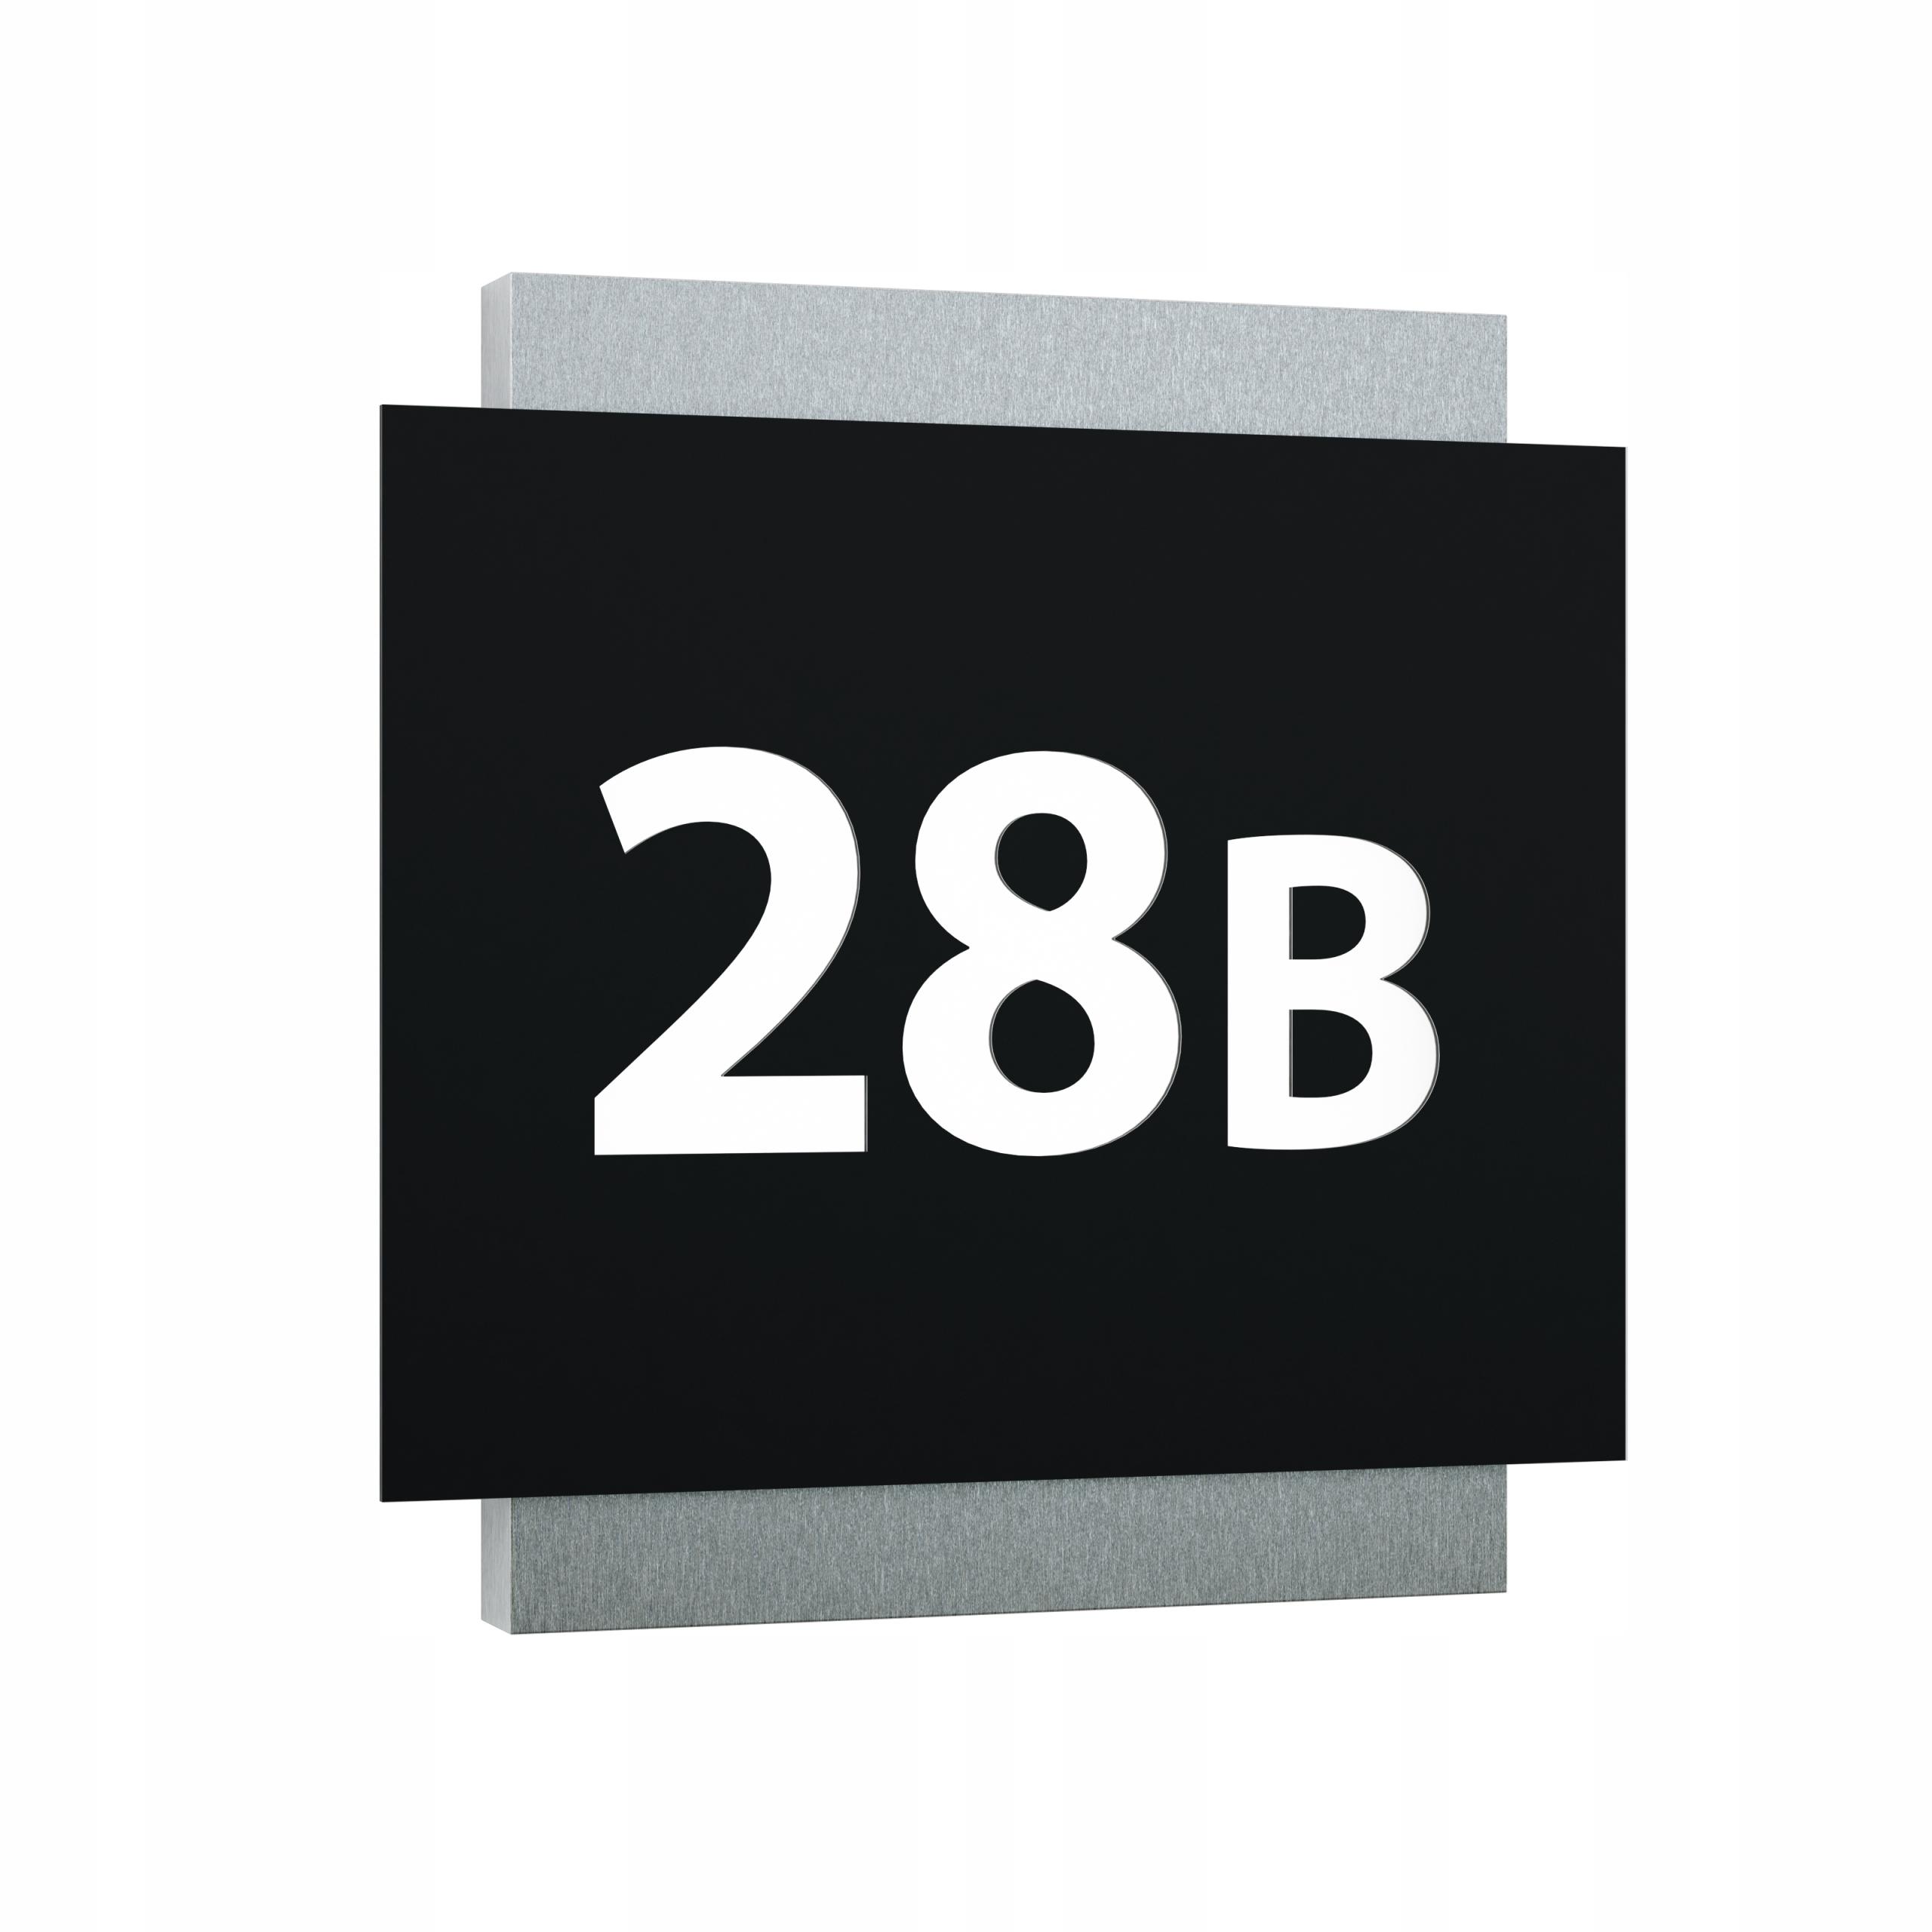 Podświetlany numer domu Tlayer BL LED 35x35cm